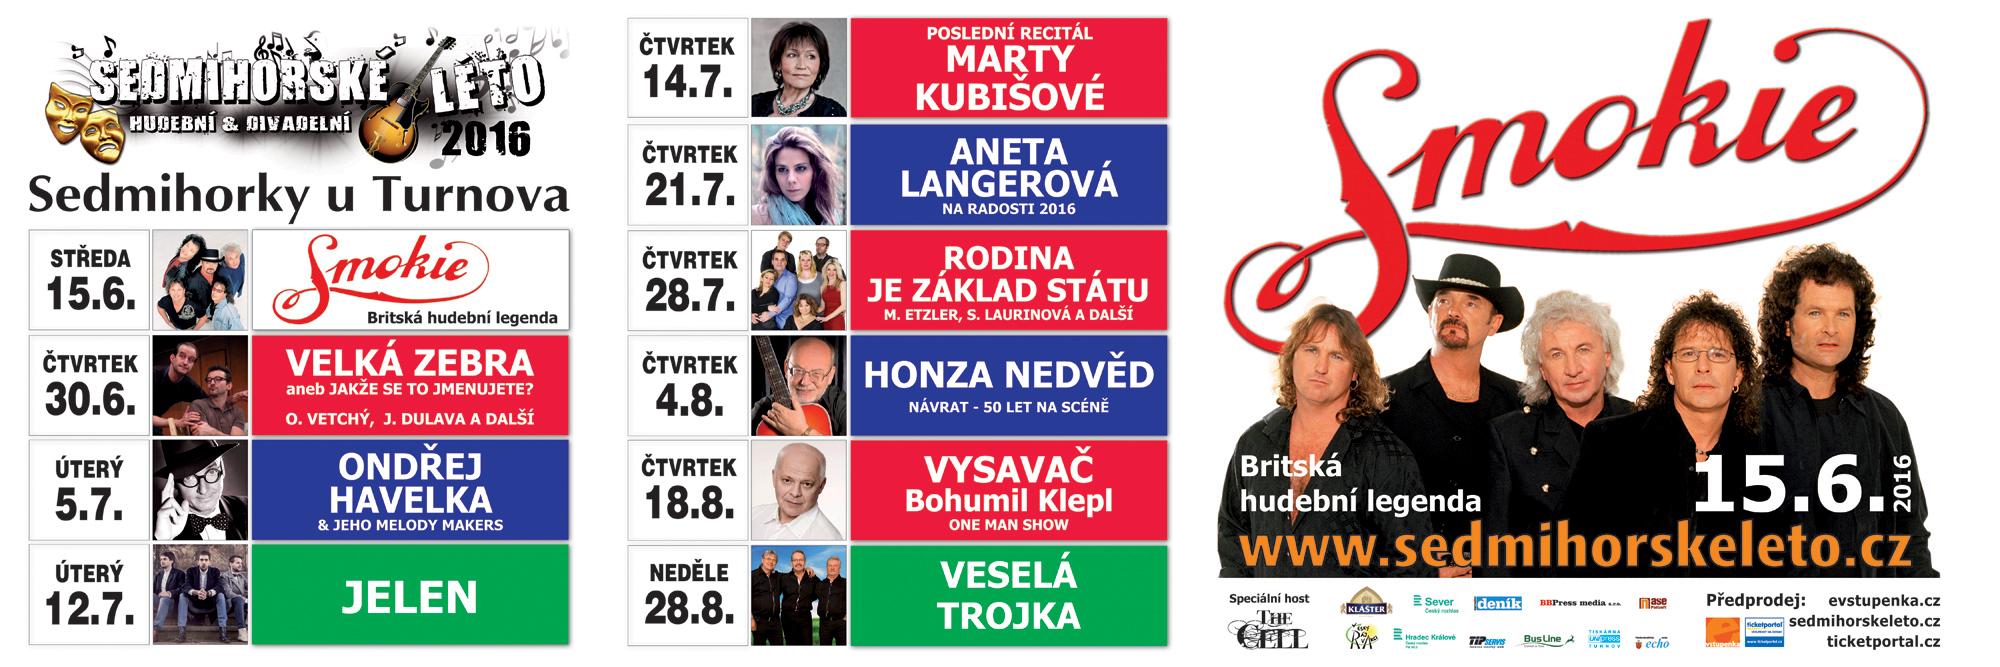 sedmihorské léto 2016 - smokie - jelen - český ráj v akci